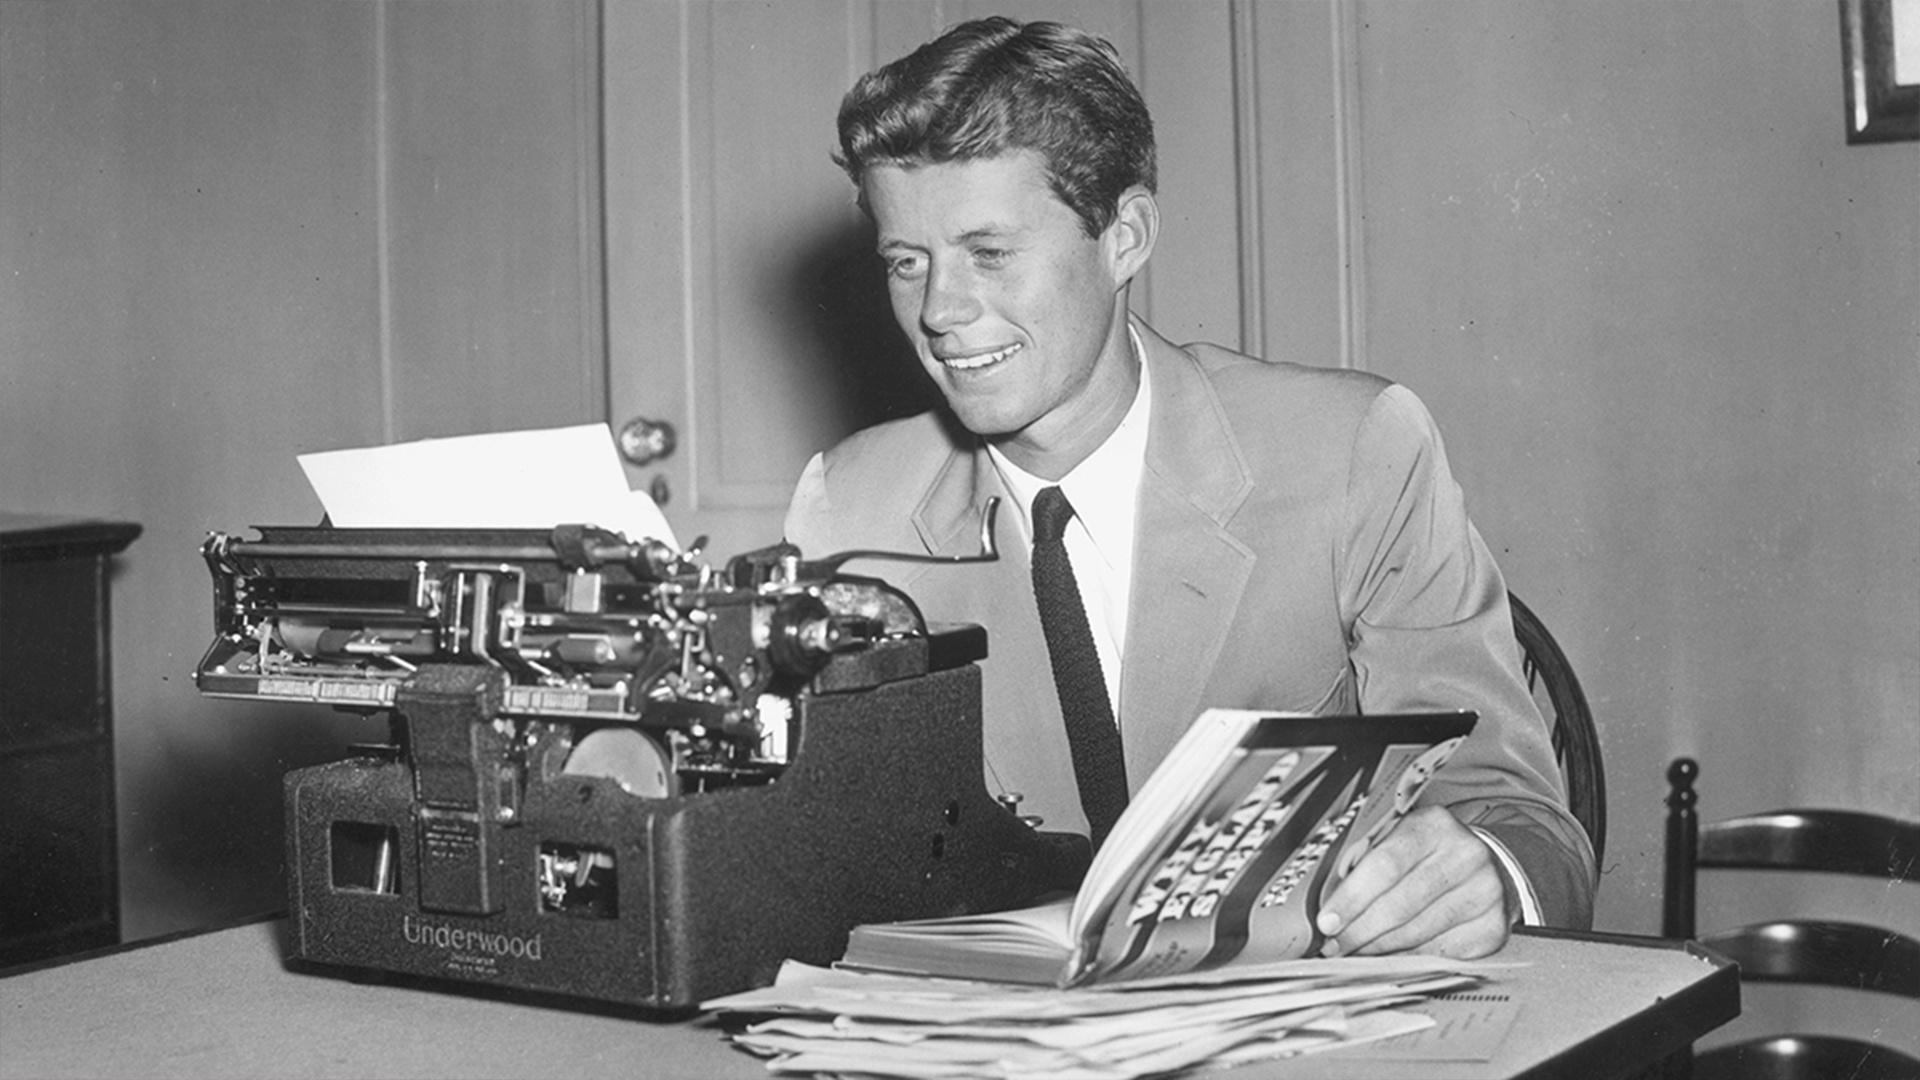 John F. Kennedy Through the Years